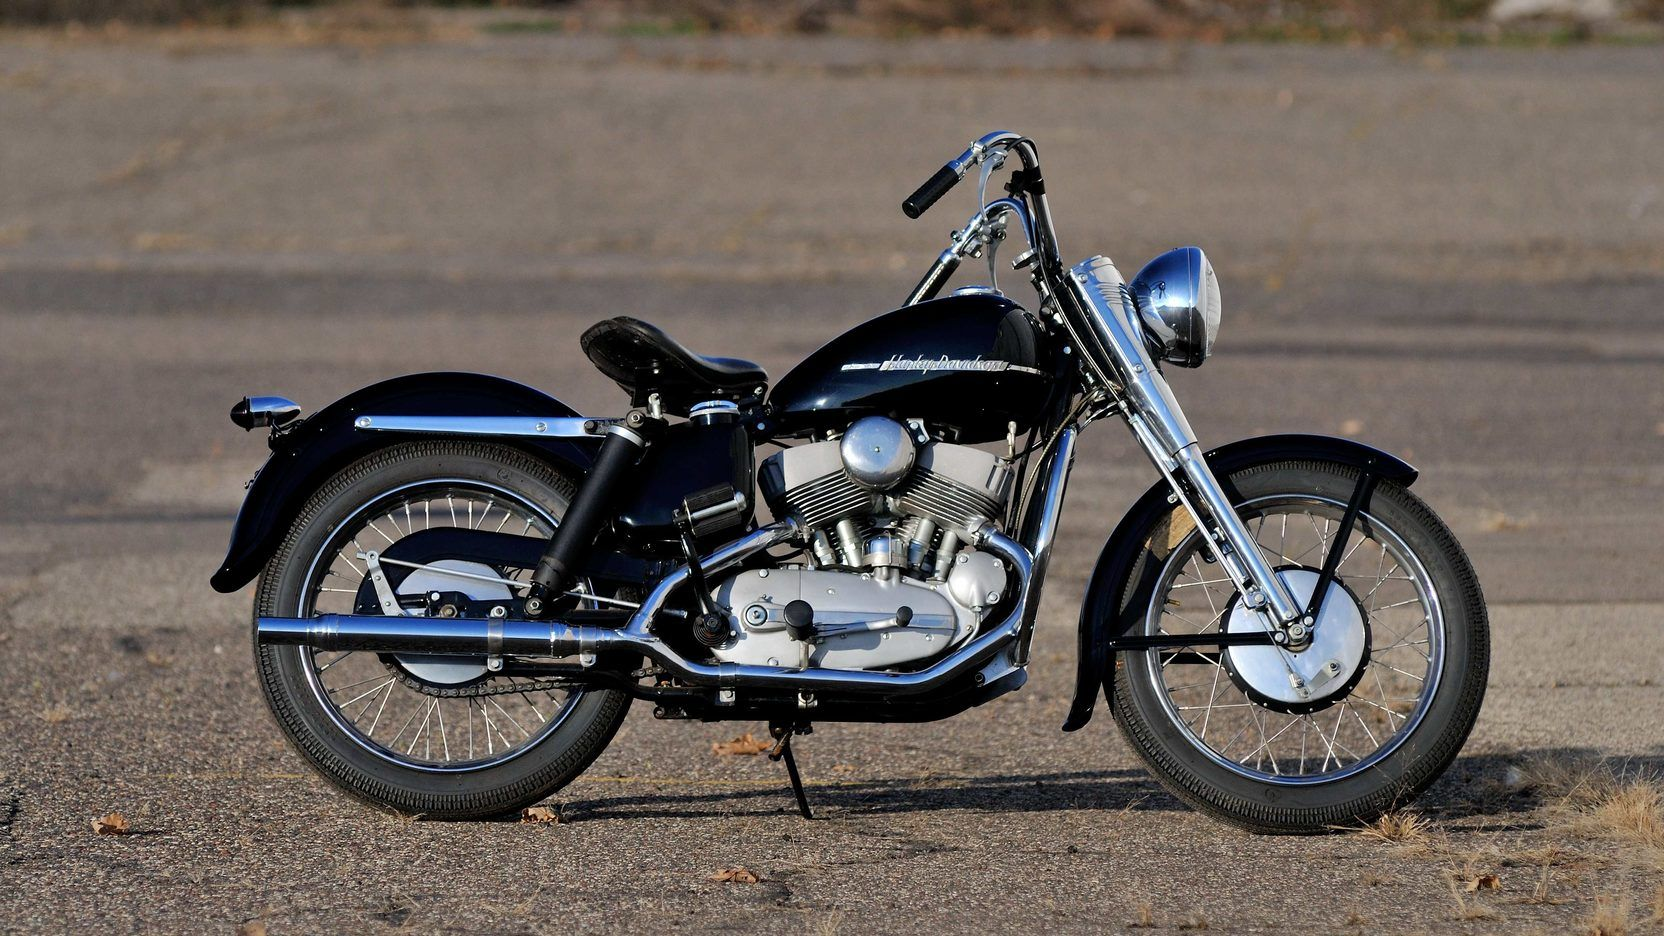 1952 harleydavidson k first year k model lot s114 las